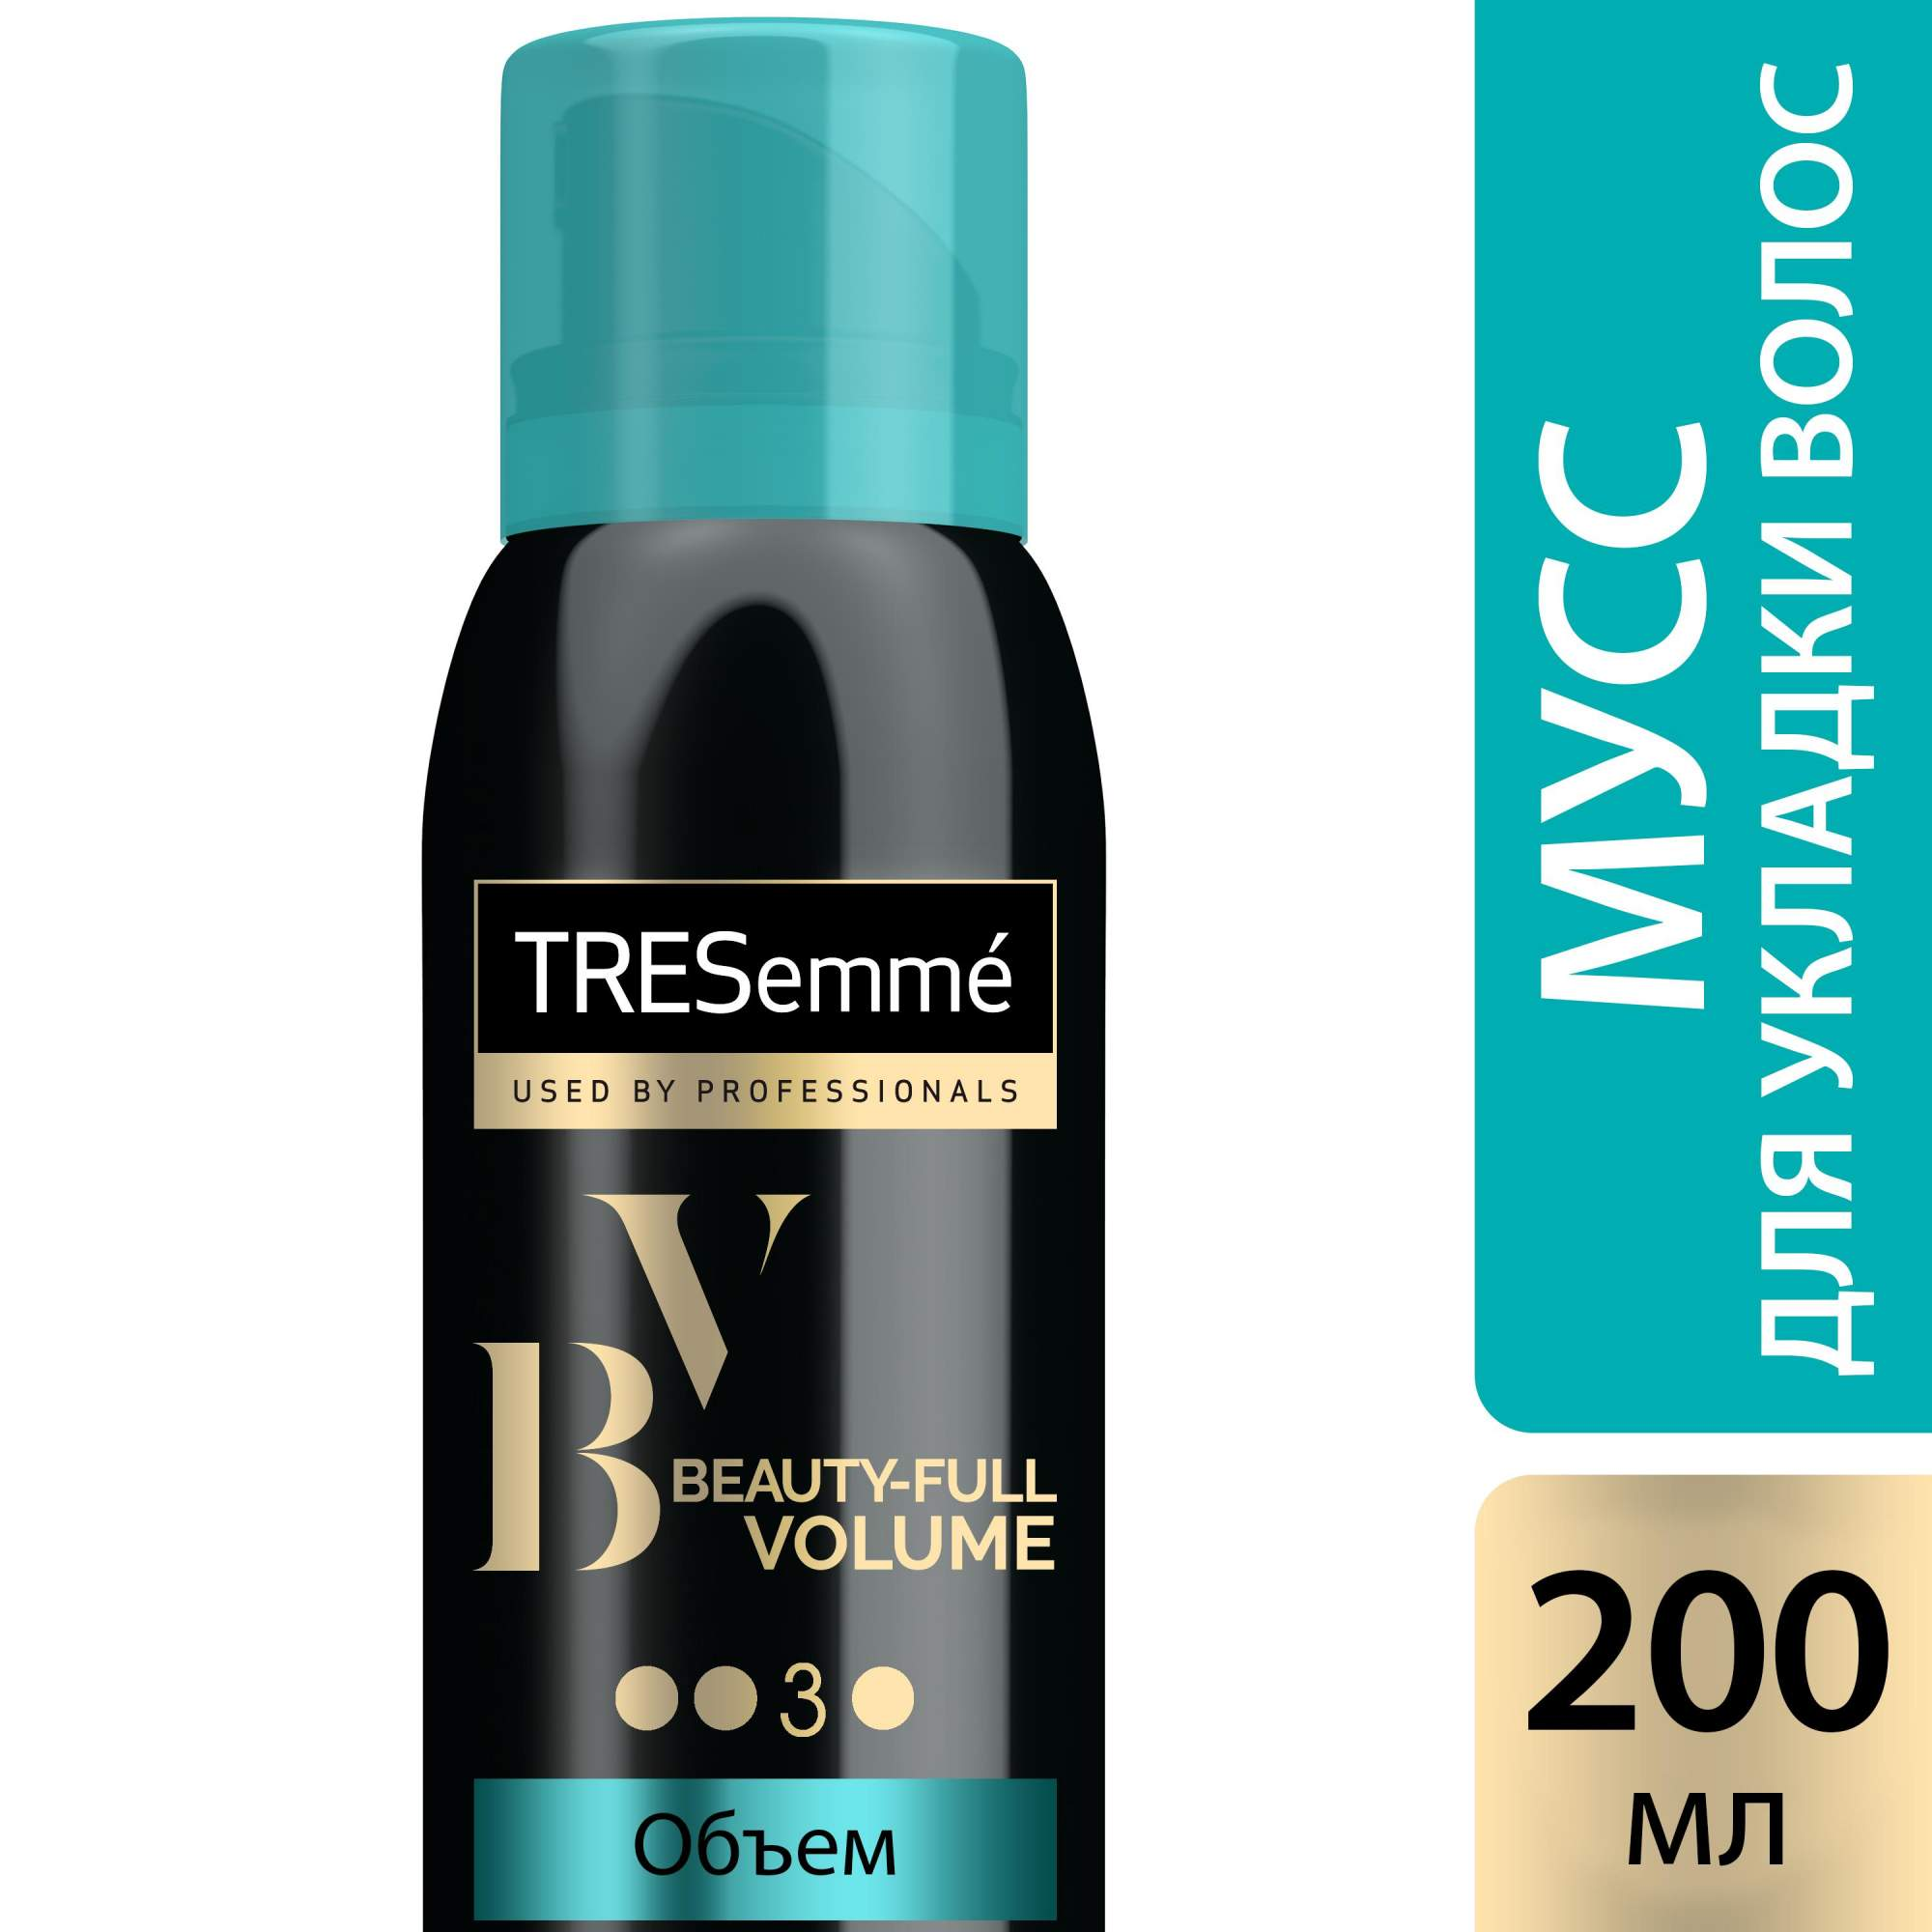 Мусс для укладки волос TRESemme Beauty-full Volume Объем 200 мл